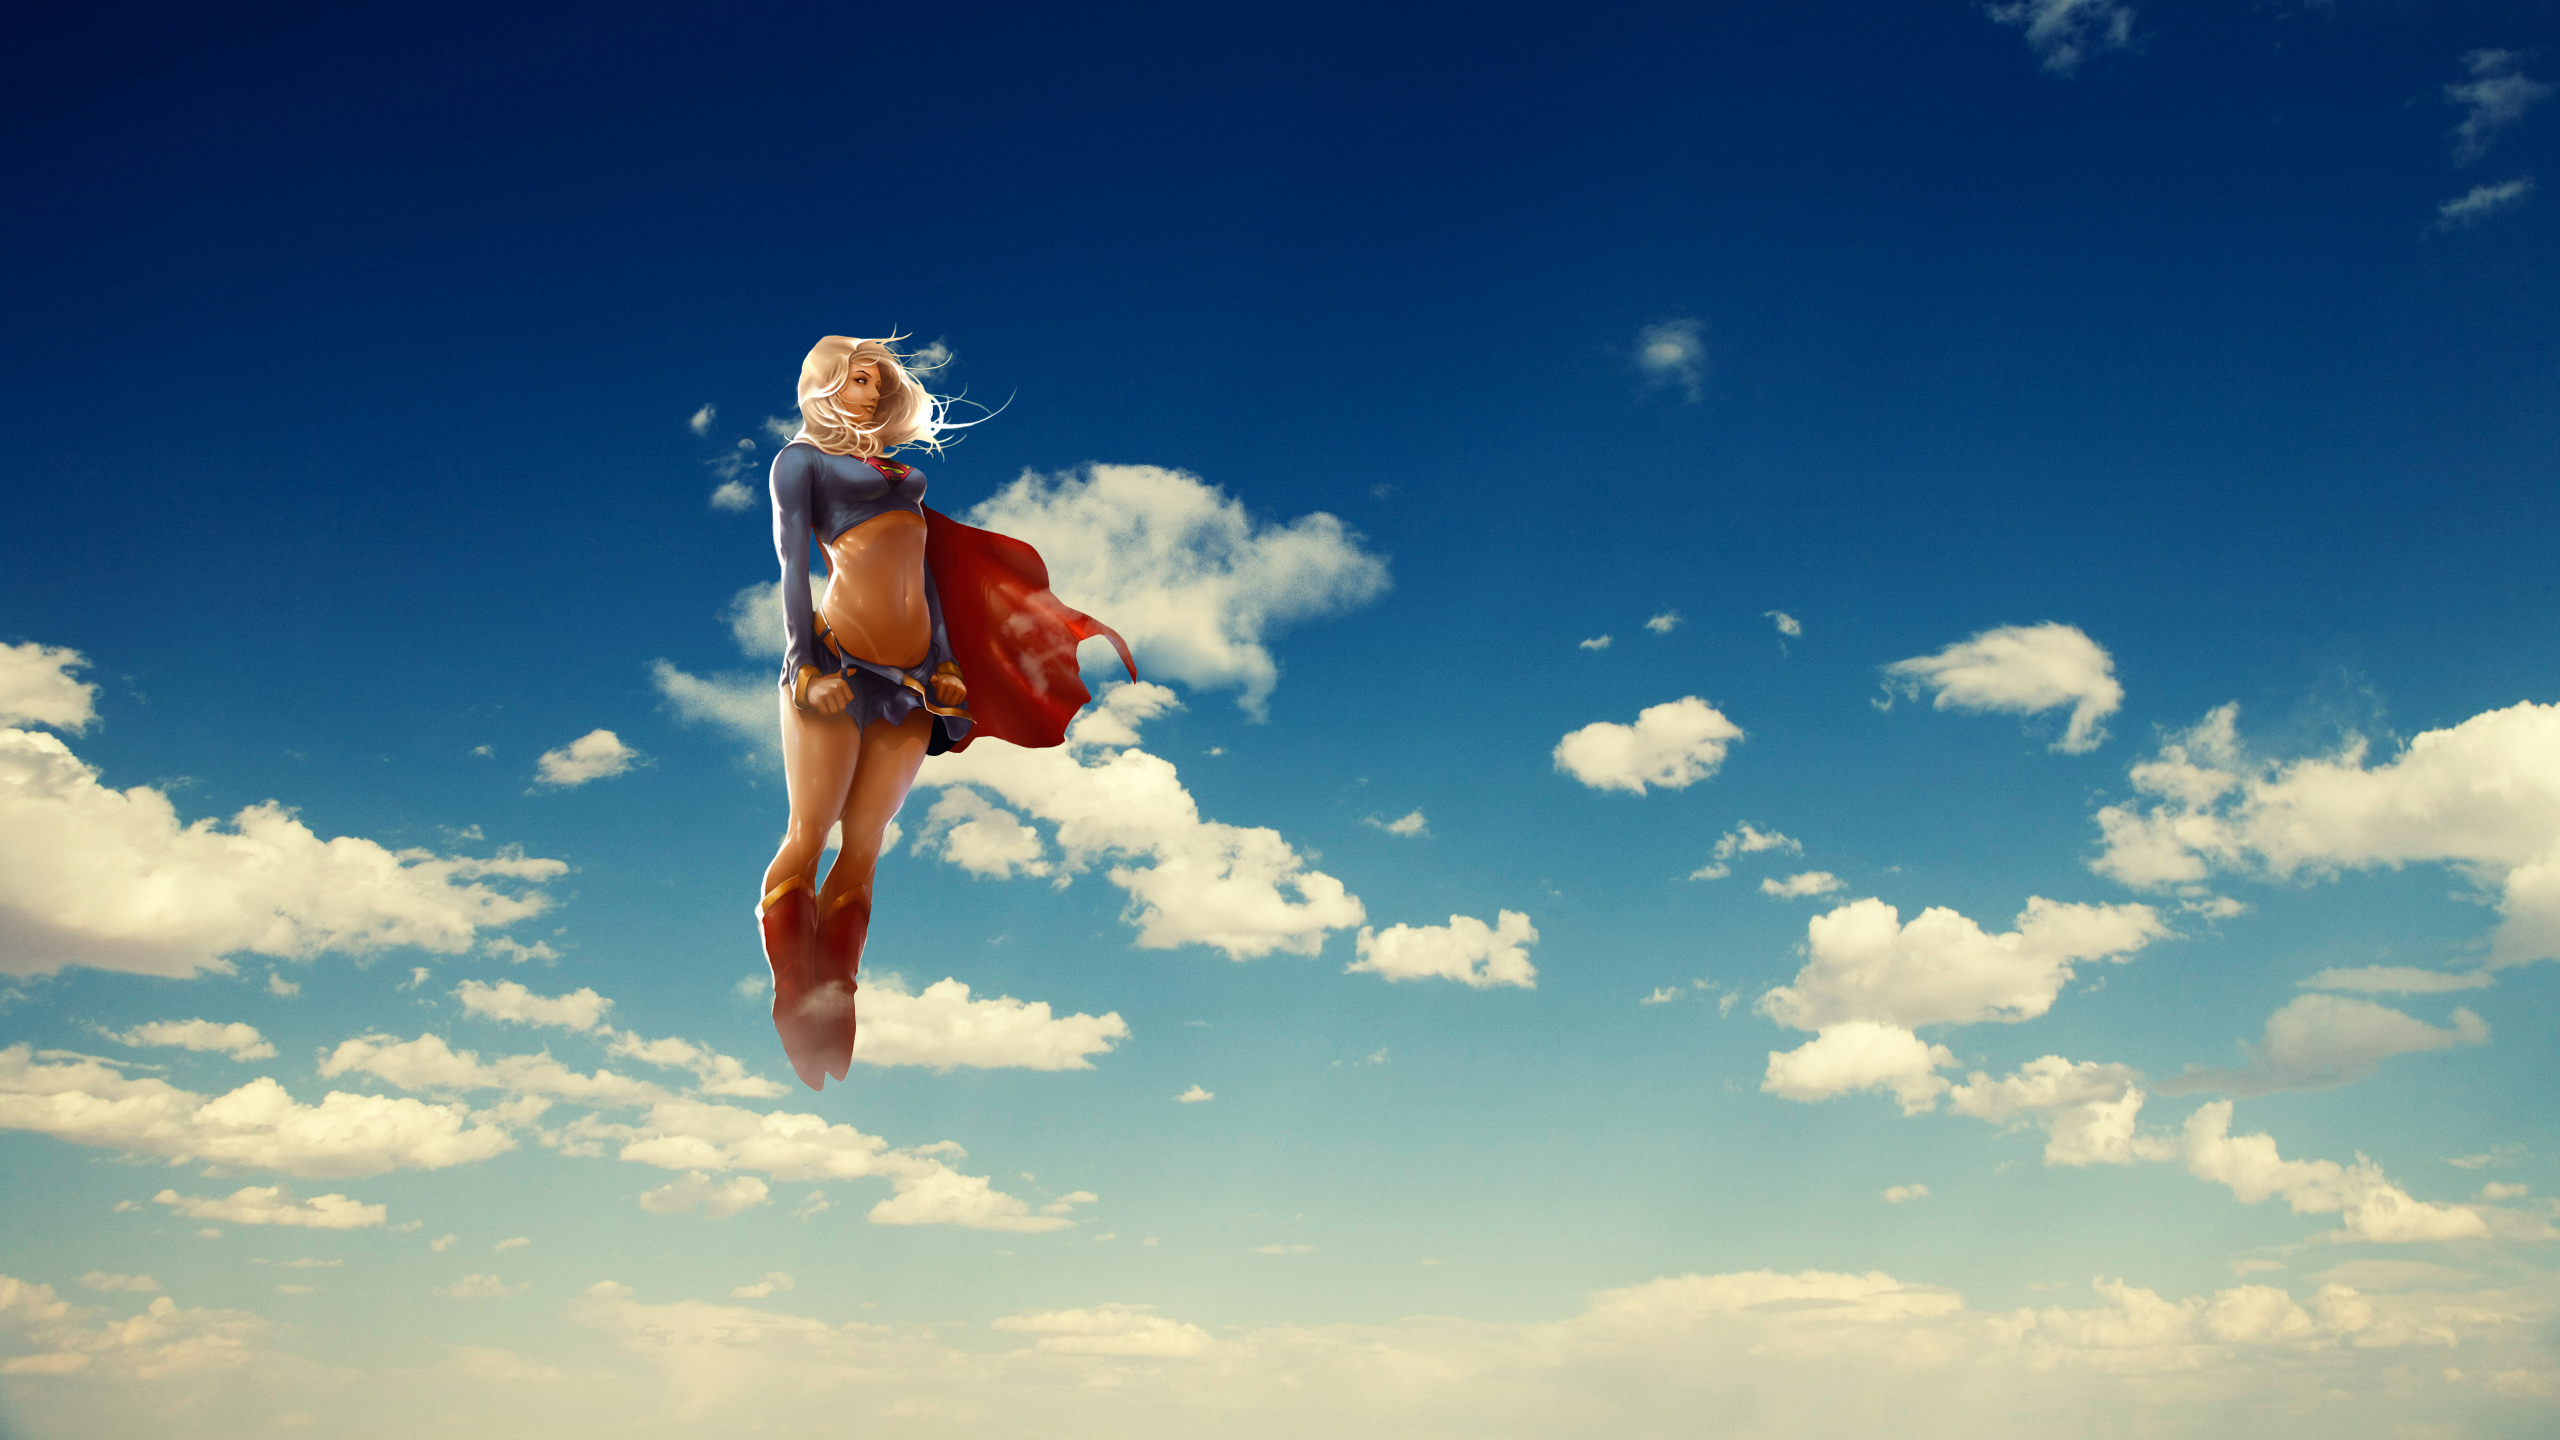 Bande-dessinées - Supergirl  Fond d'écran